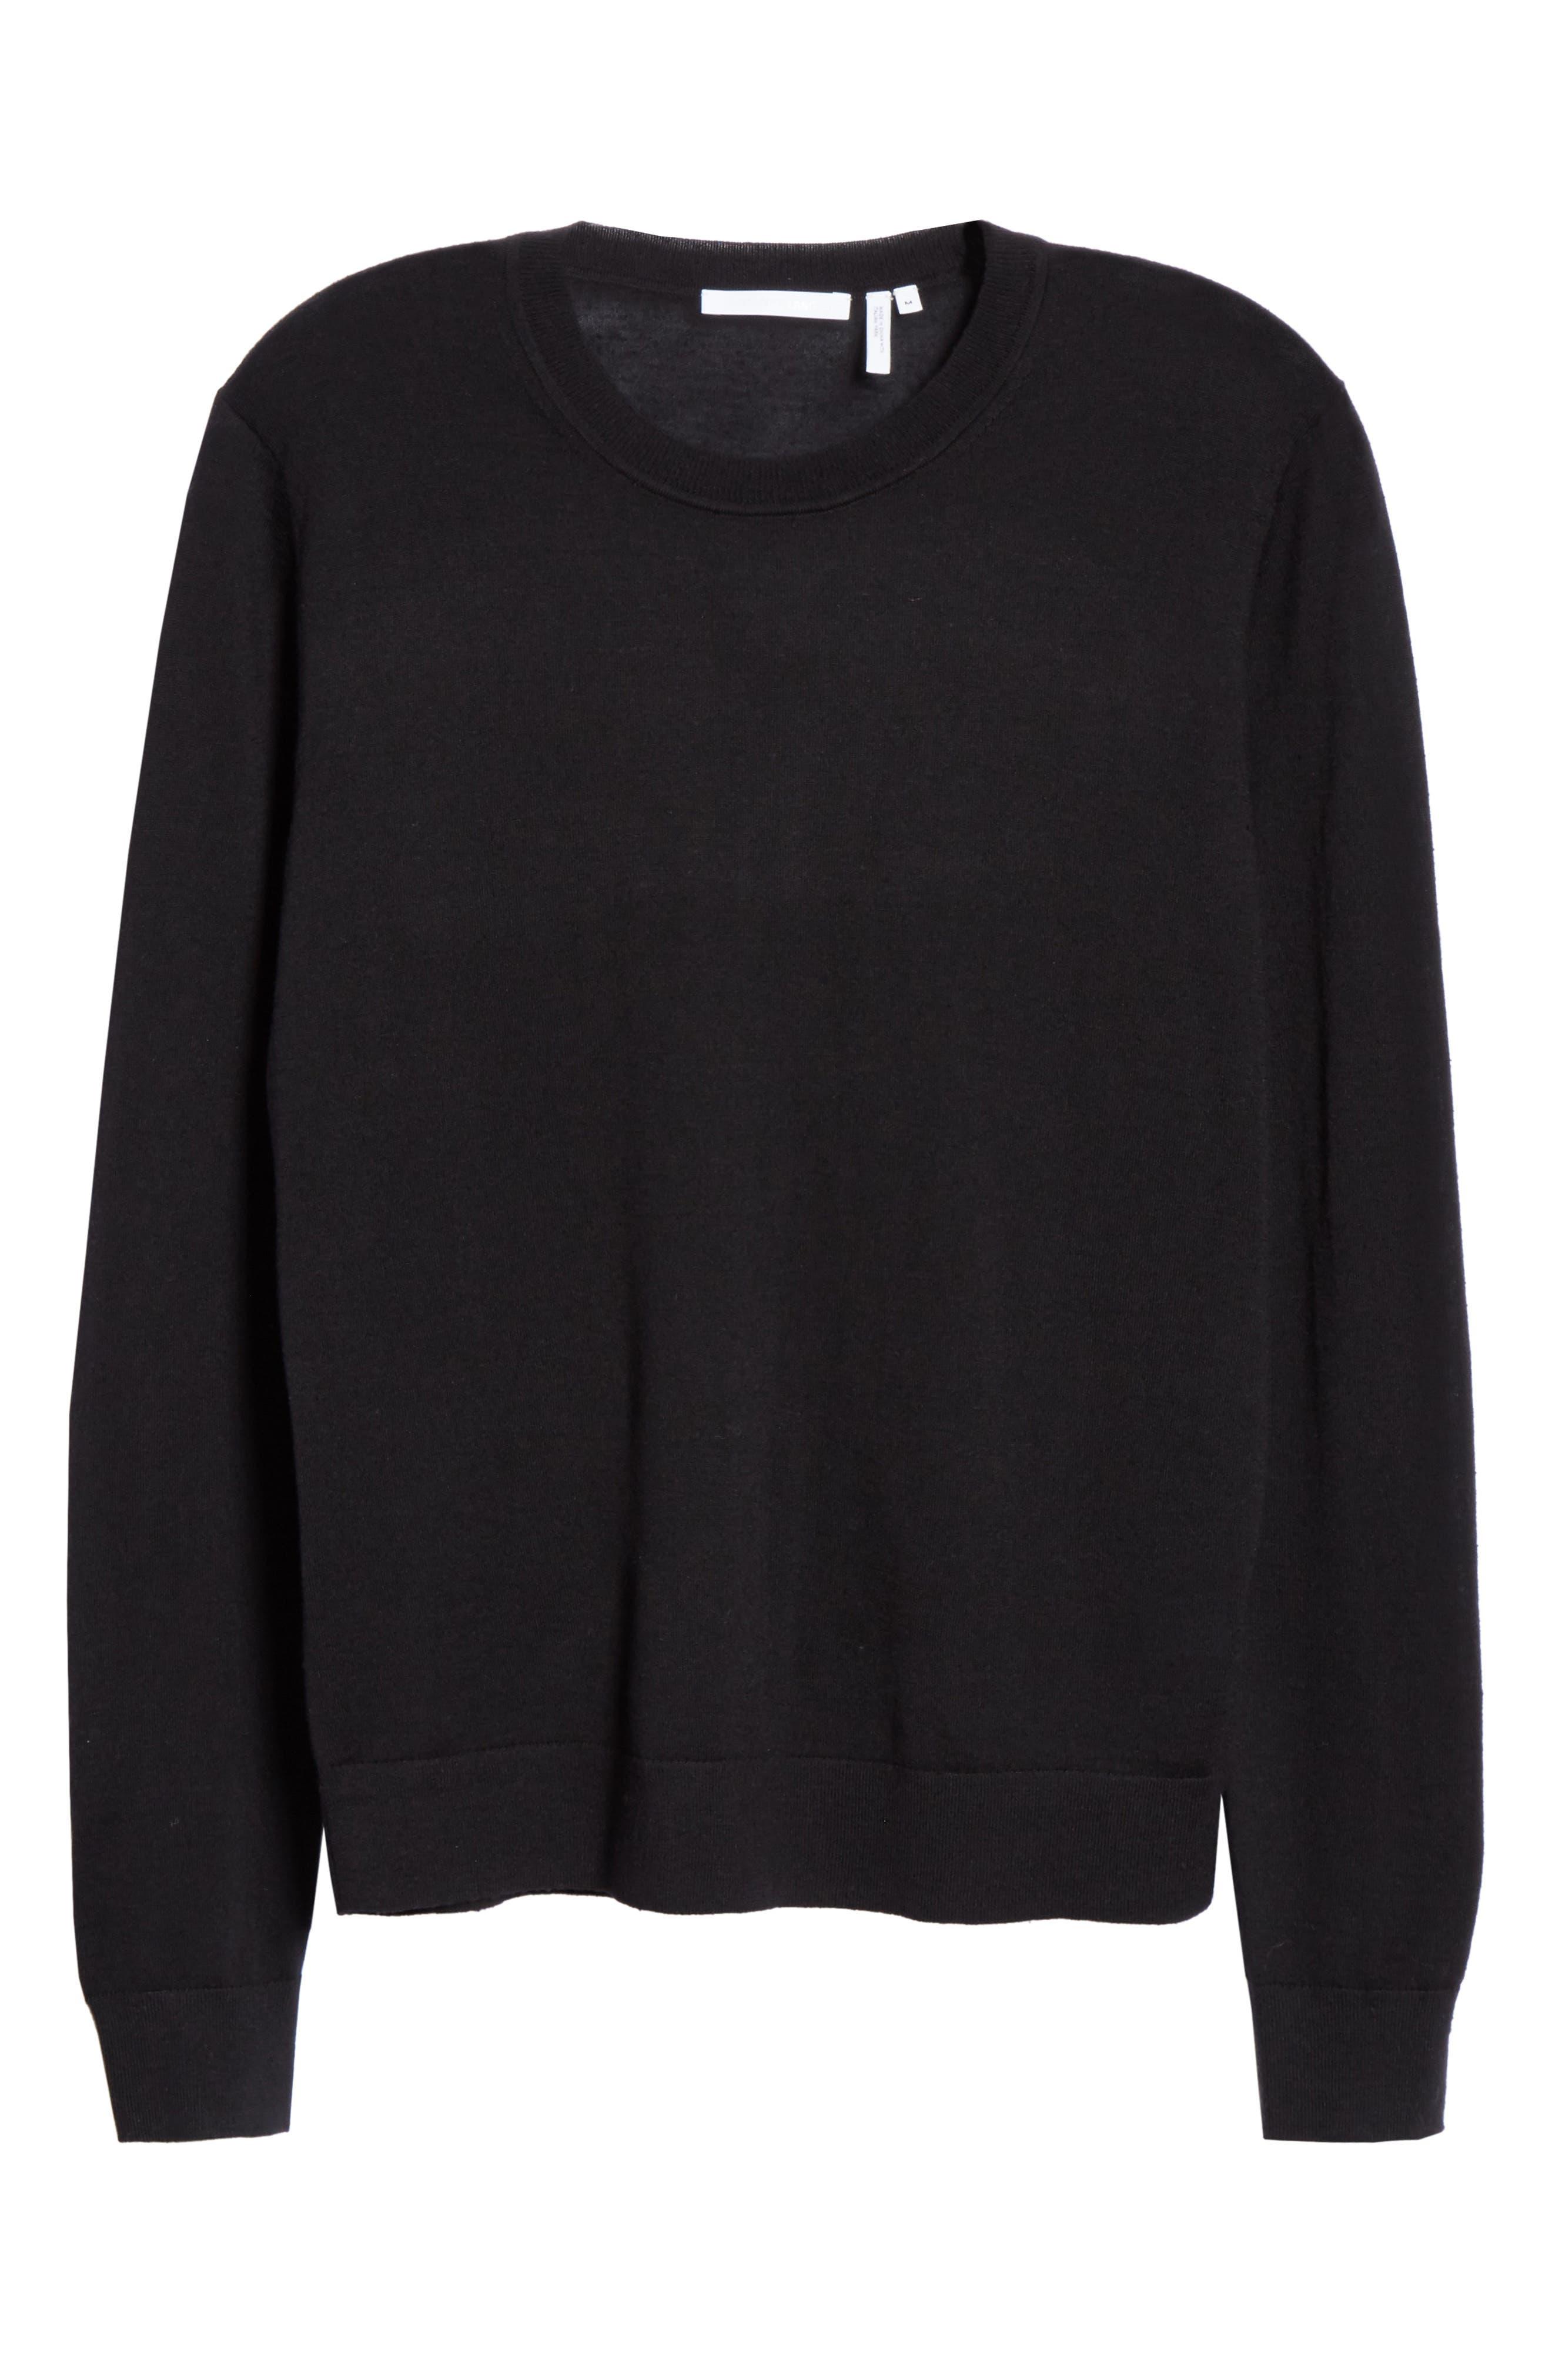 HELMUT LANG, Back Logo Wool & Silk Sweatshirt, Alternate thumbnail 6, color, BLACK